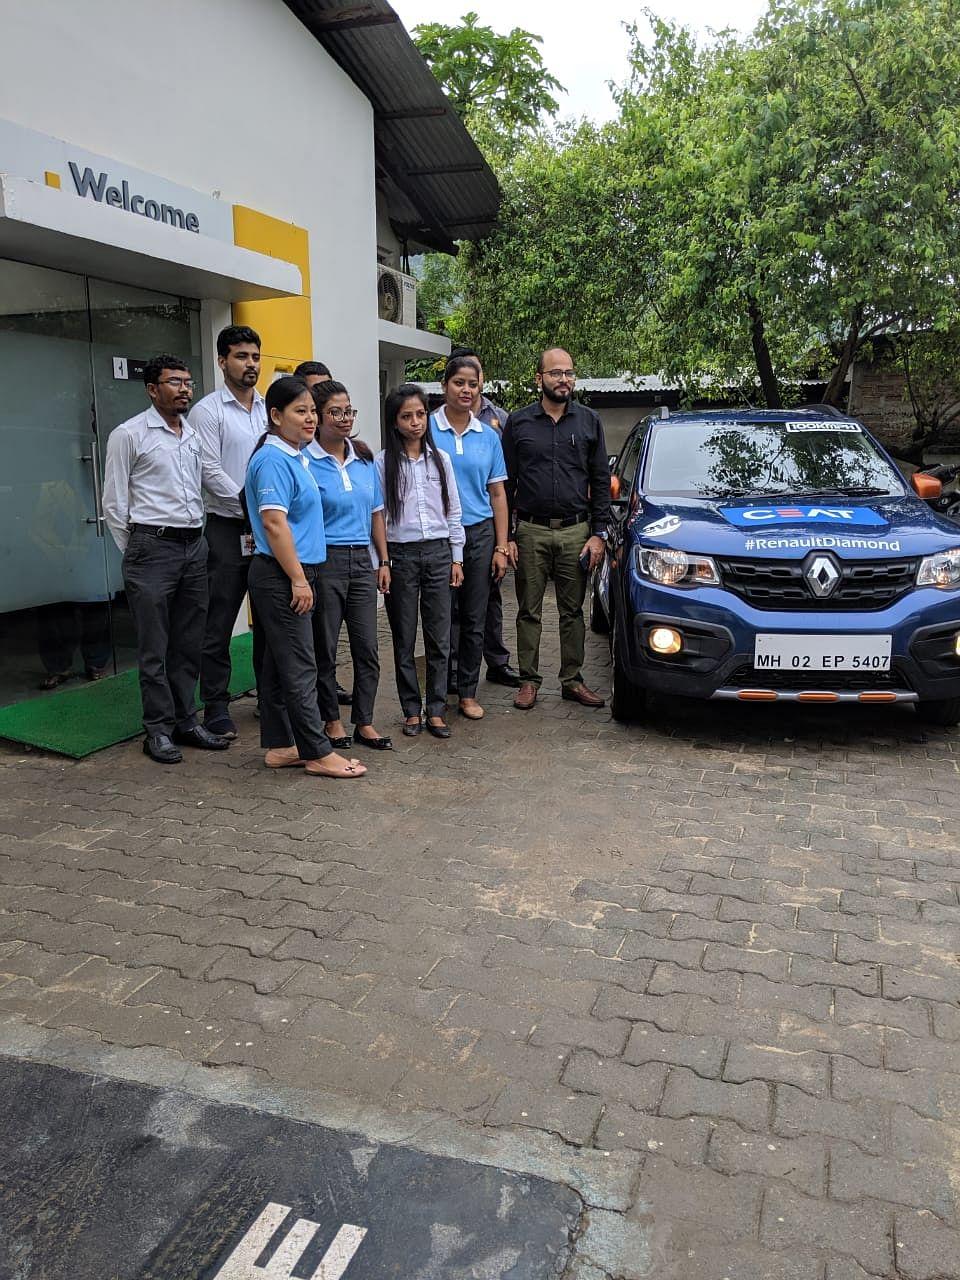 Day 24 – Renault India Diamond Trail – Guwahati to Siliguri